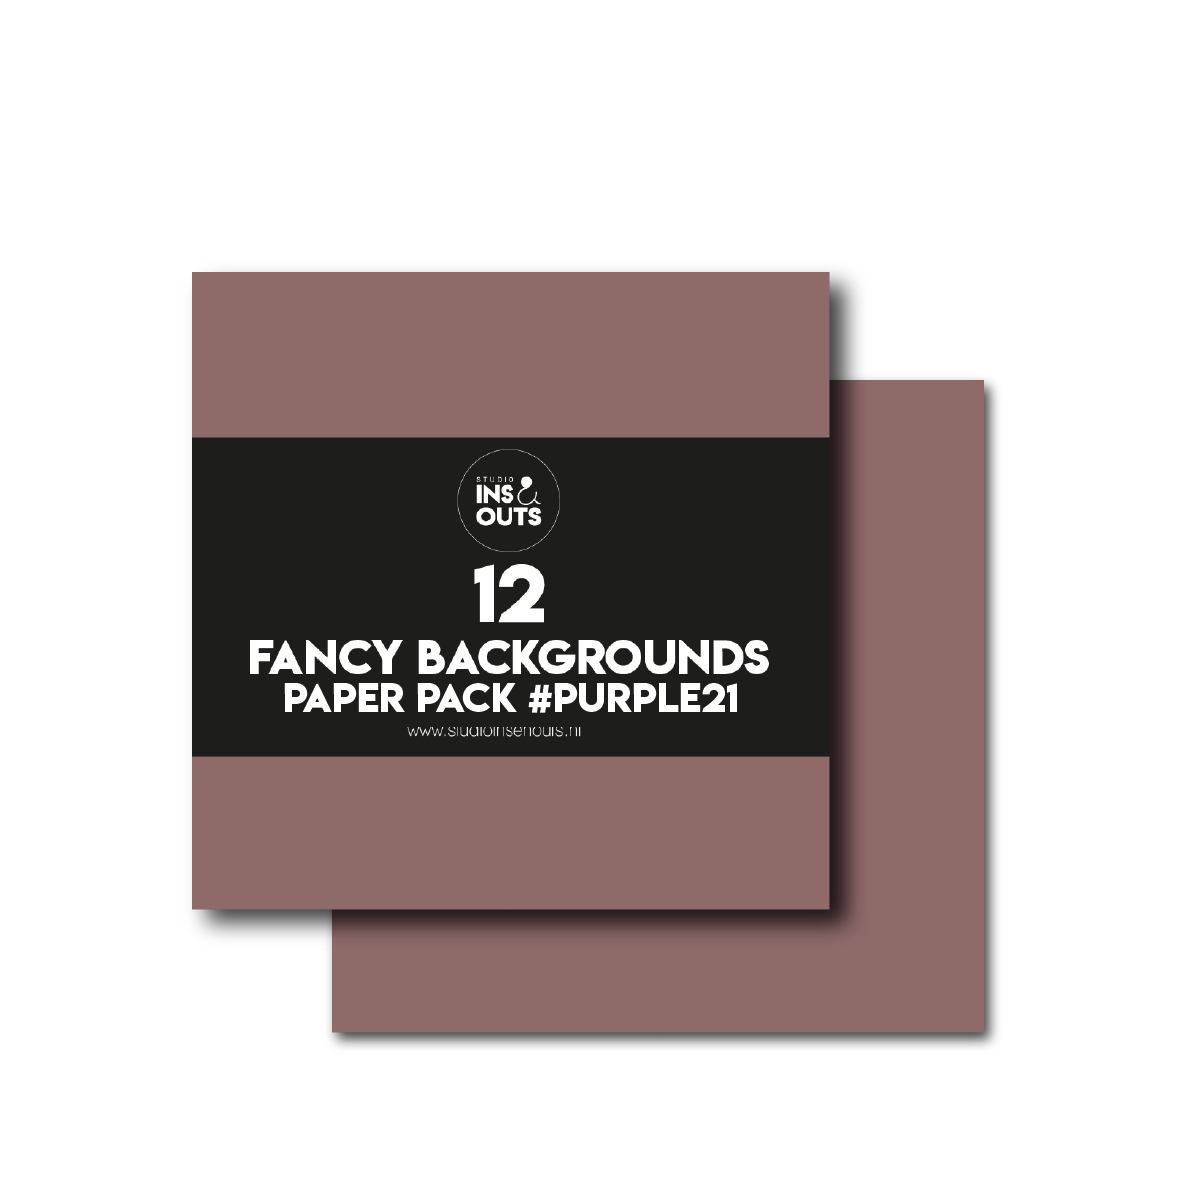 Paper Pack PURPLE'21